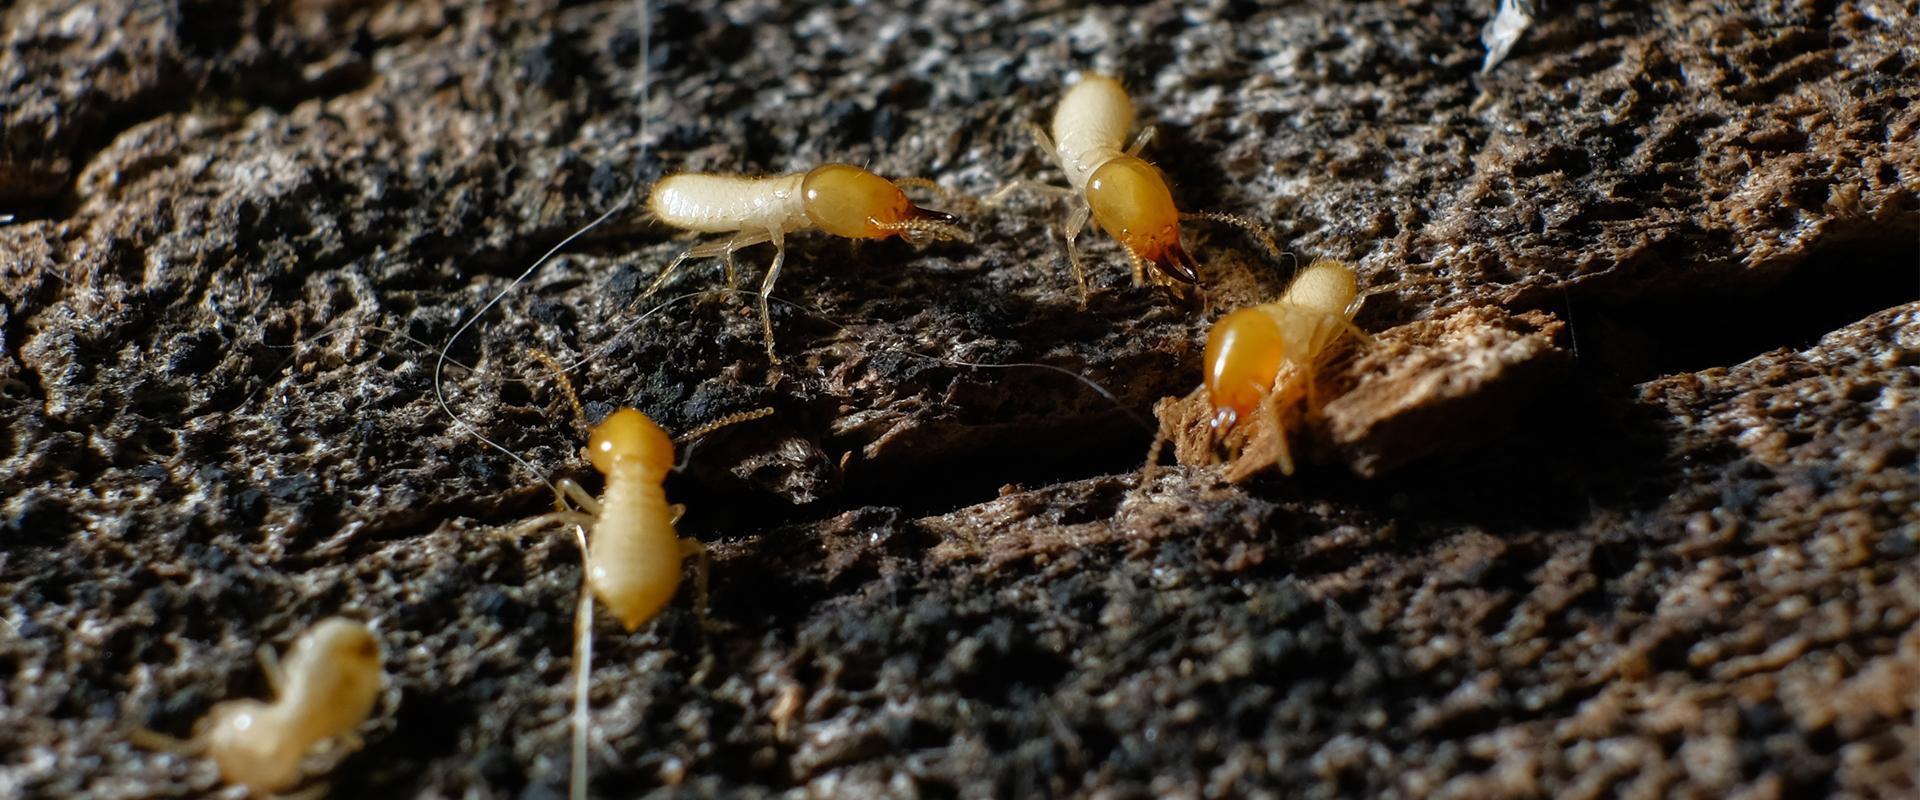 termites in a mound in fayetteville georgia